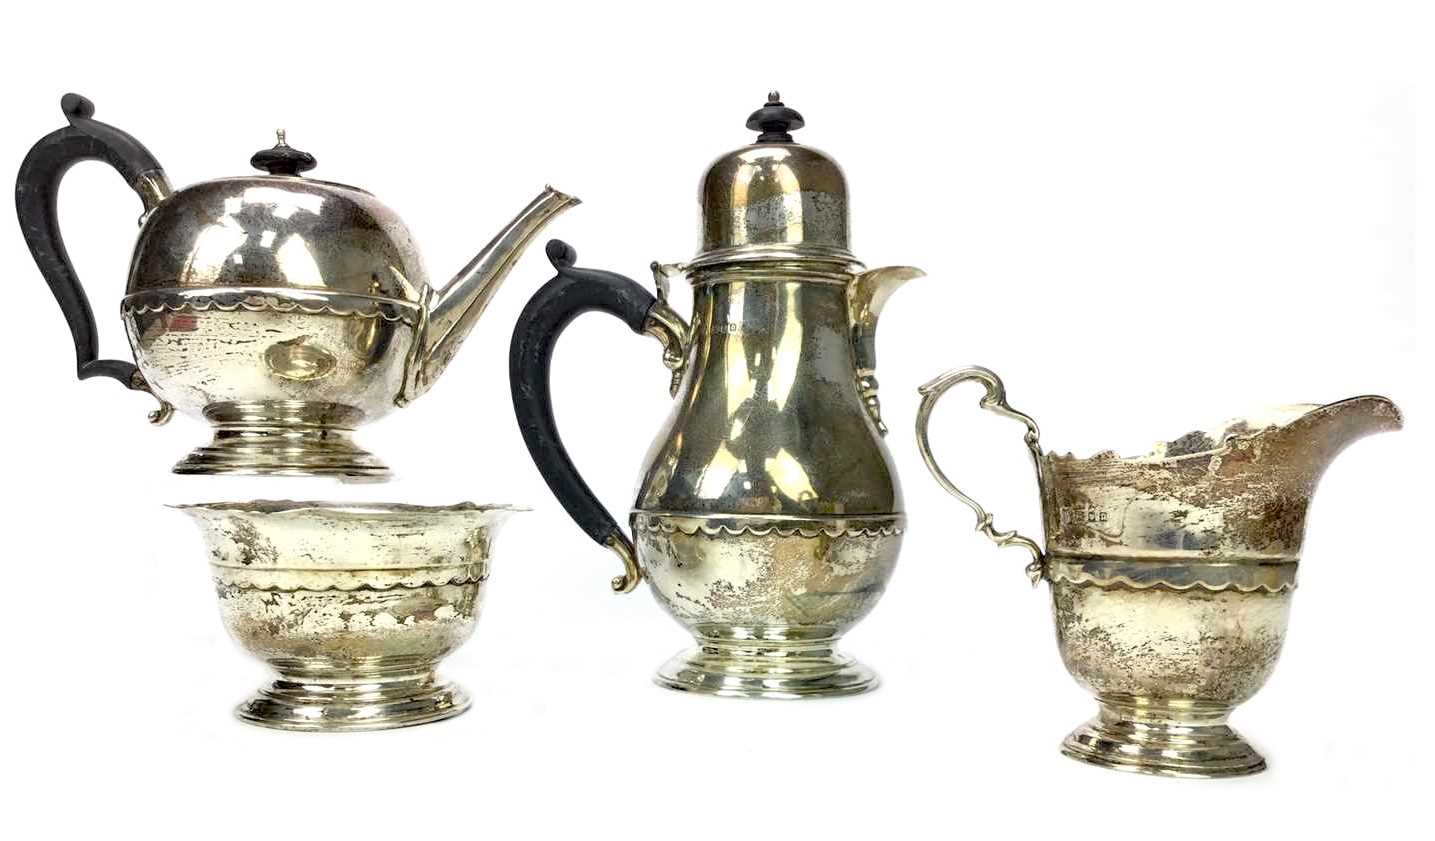 Lot 877 - A GEORGE V FOUR PIECE TEA AND COFFEE SERVICE